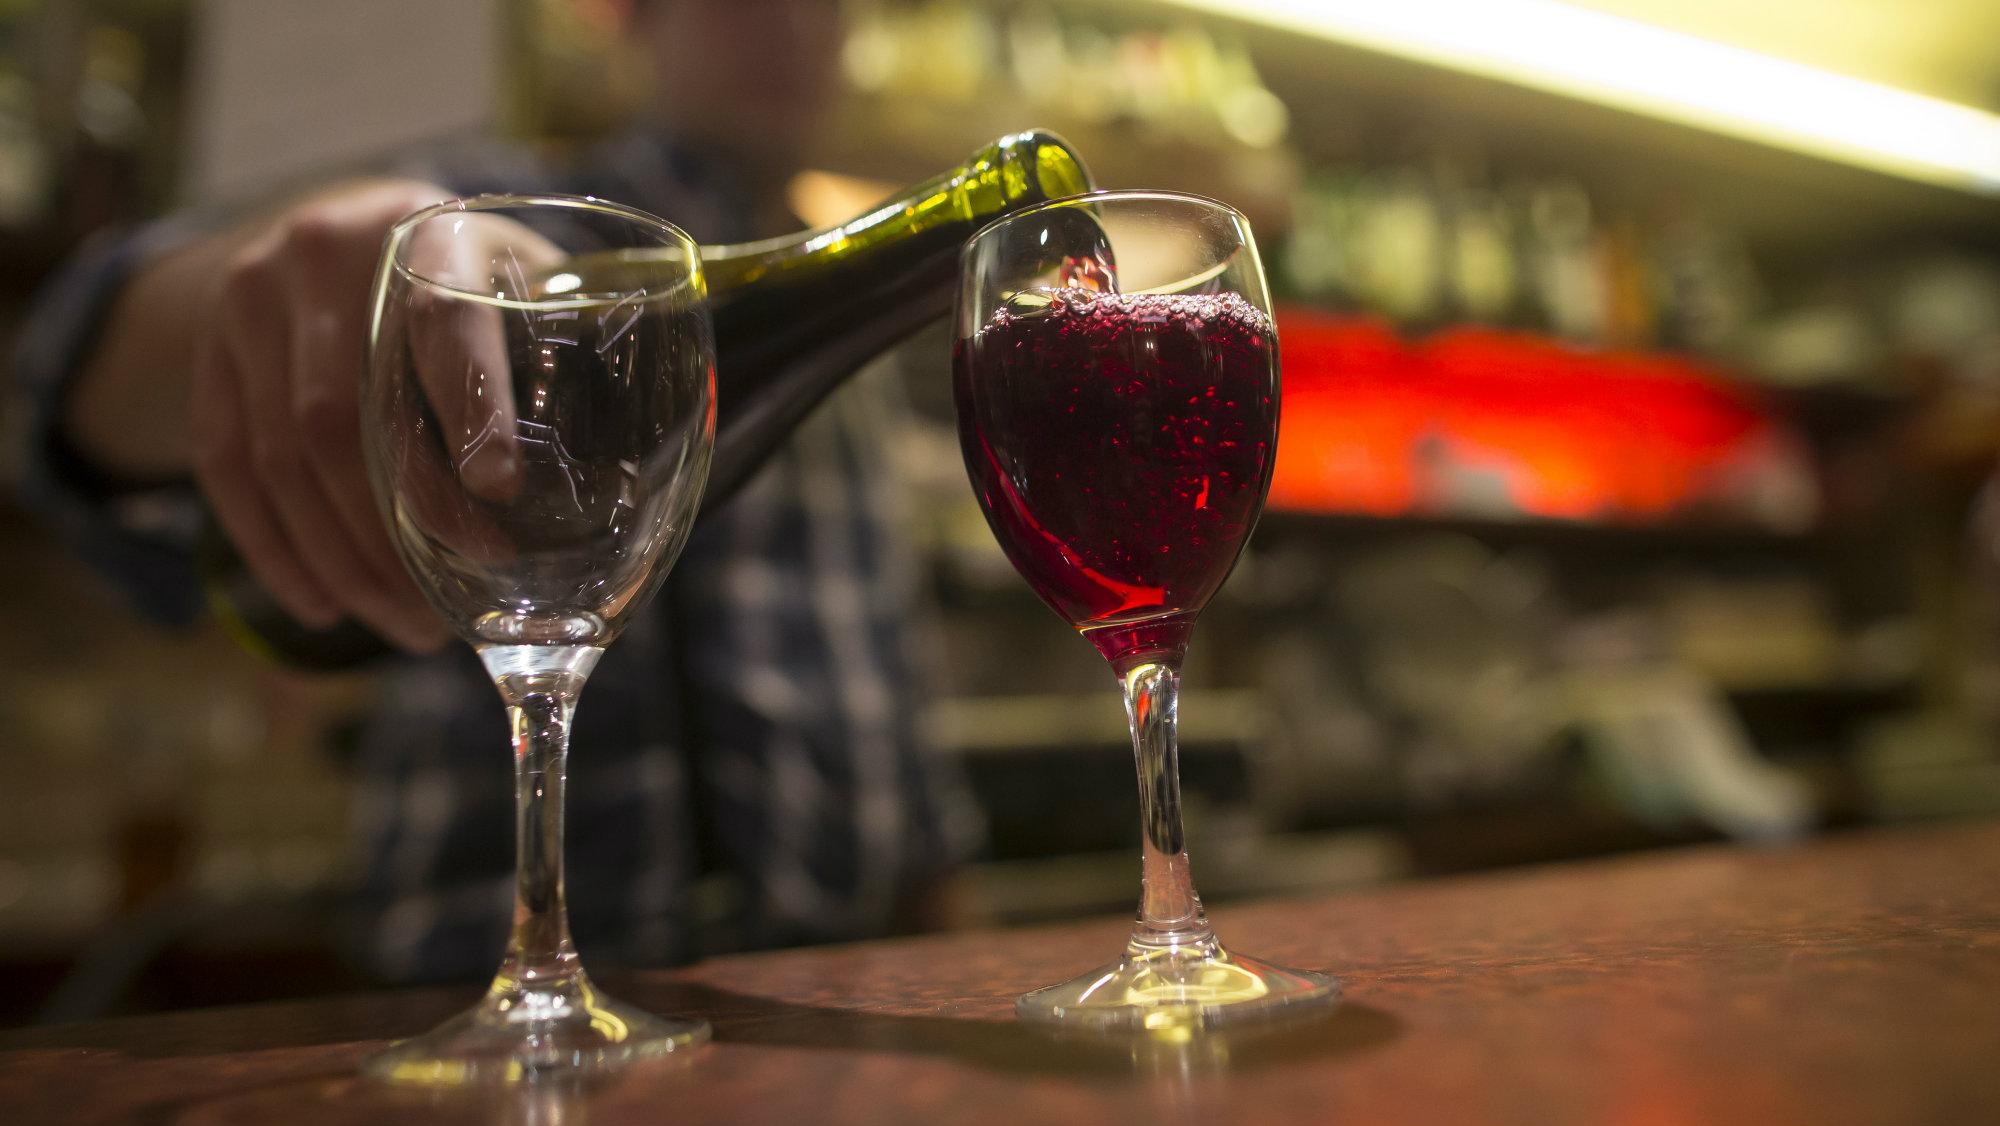 A barman pours a glass of Beaujolais Nouveau wine in a bistrot in Paris, France.